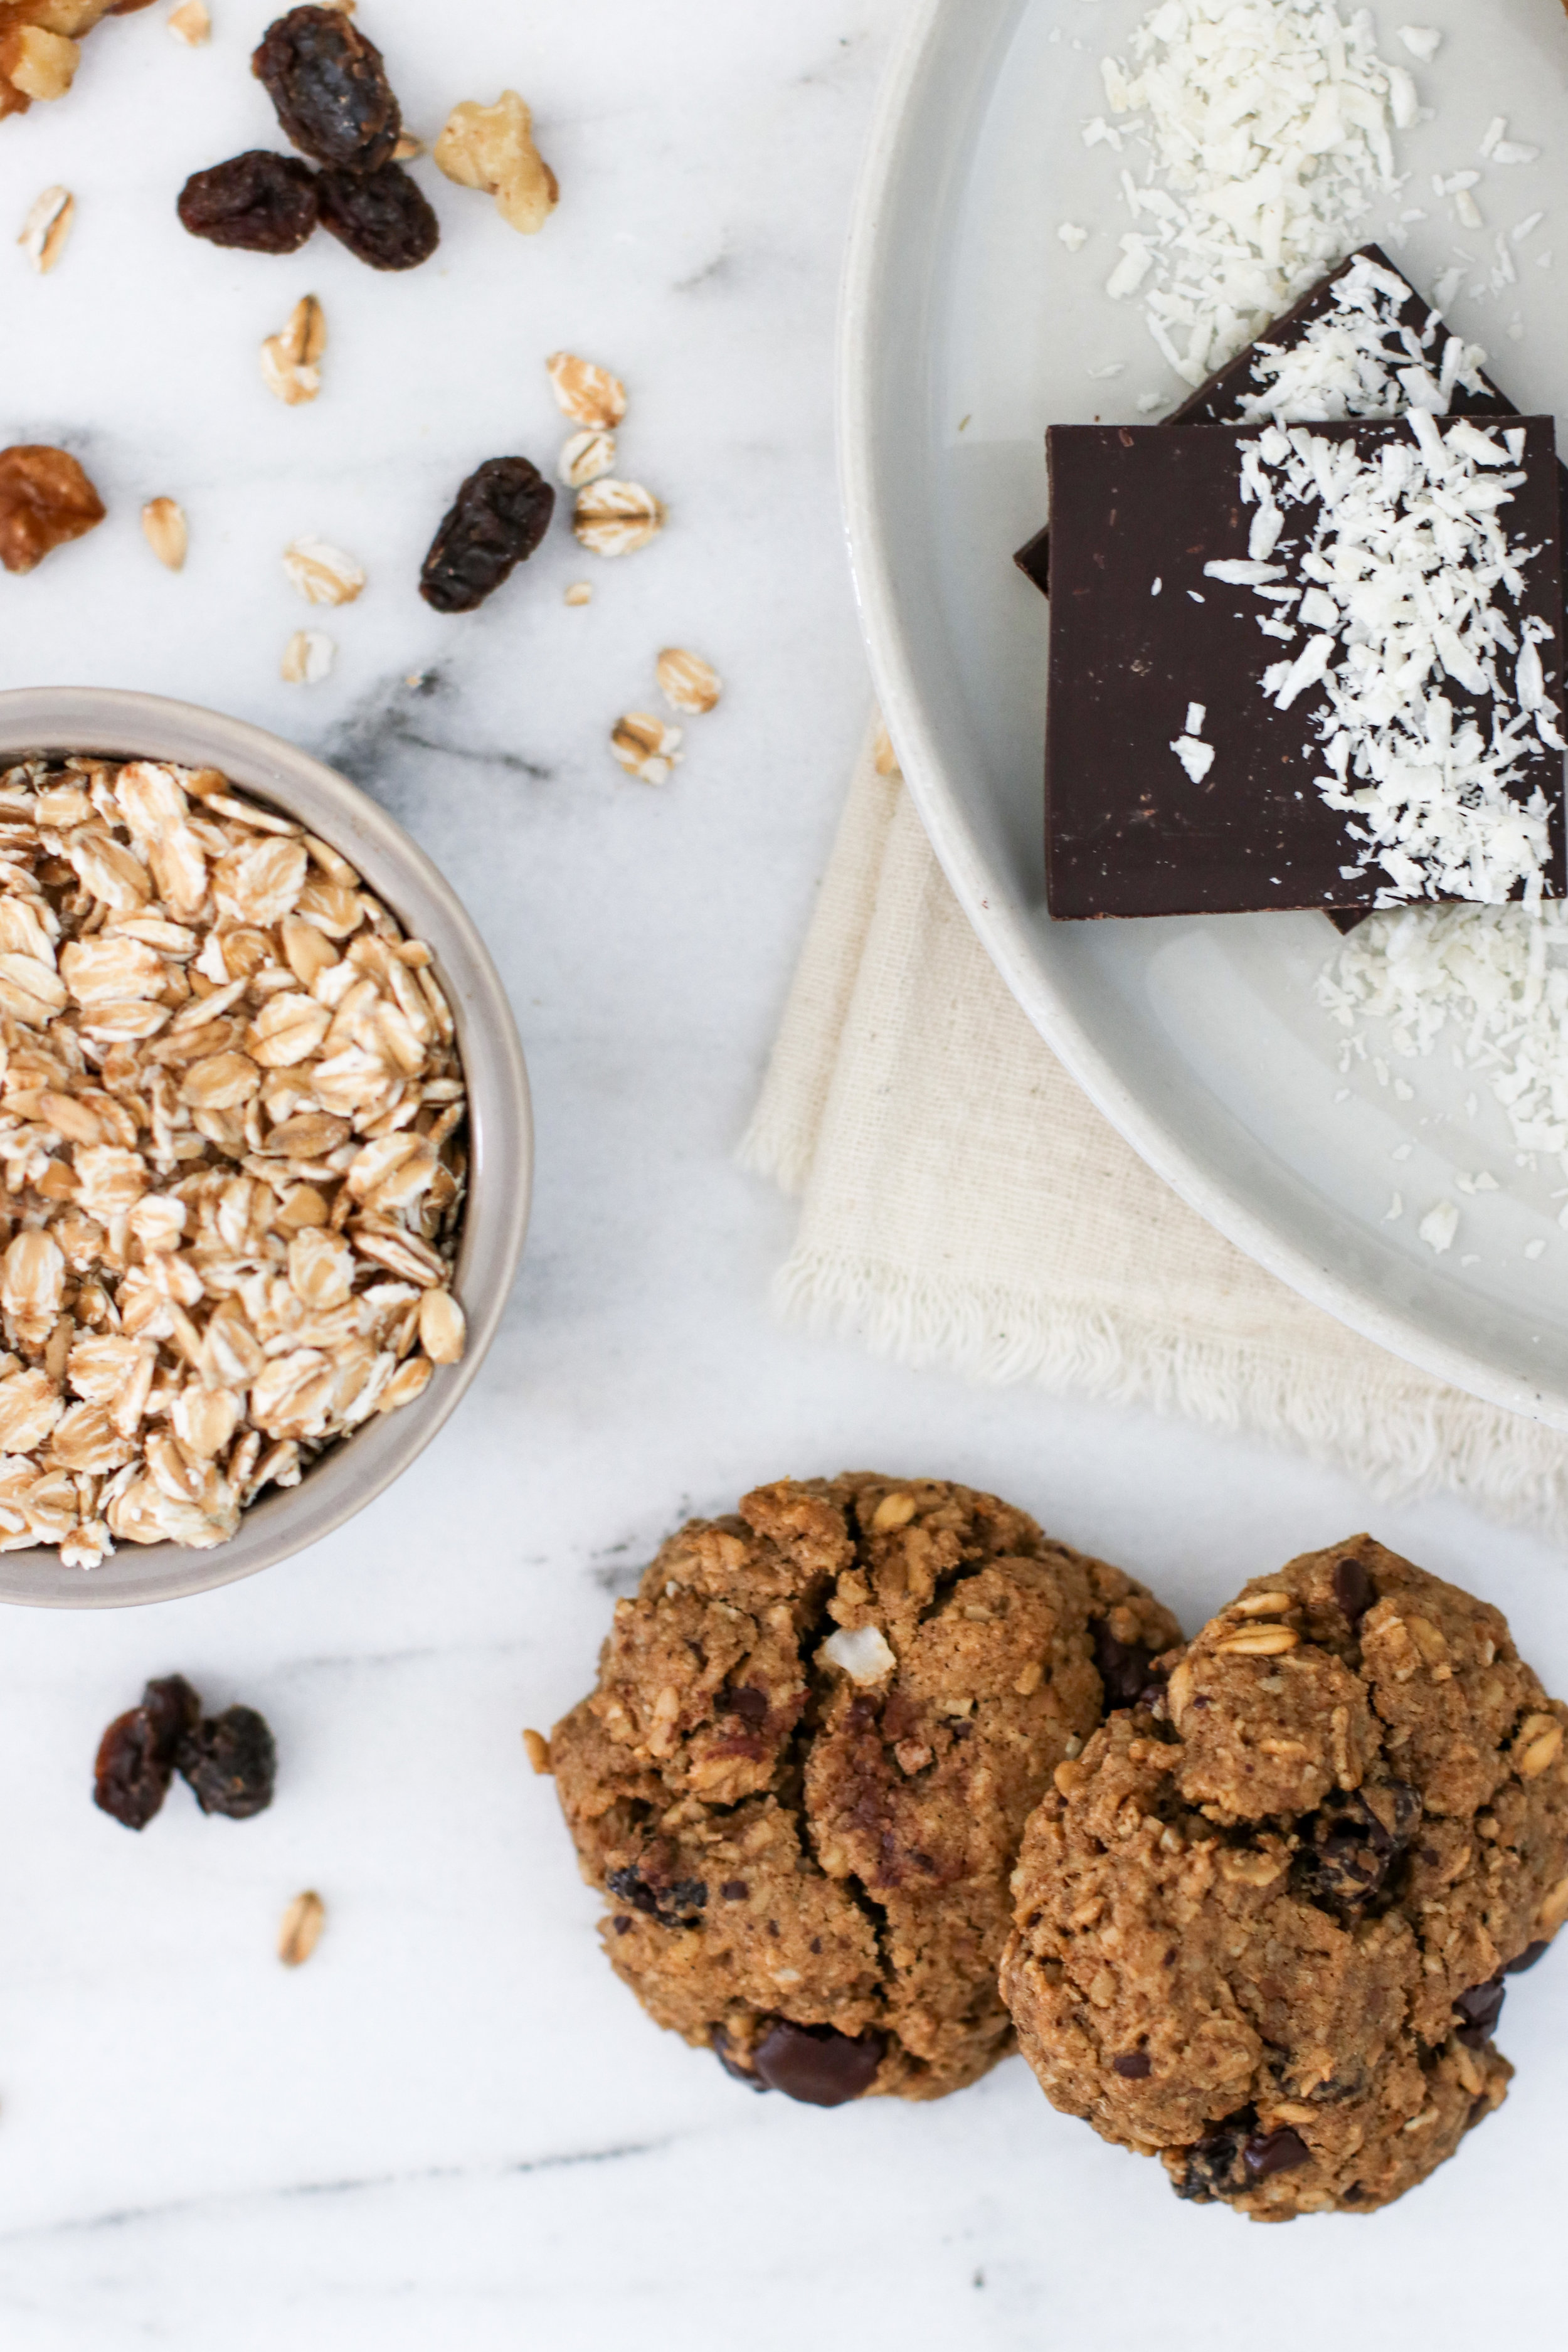 Chocolate Oatmeal Raisin Walnut Cookies 5.jpg